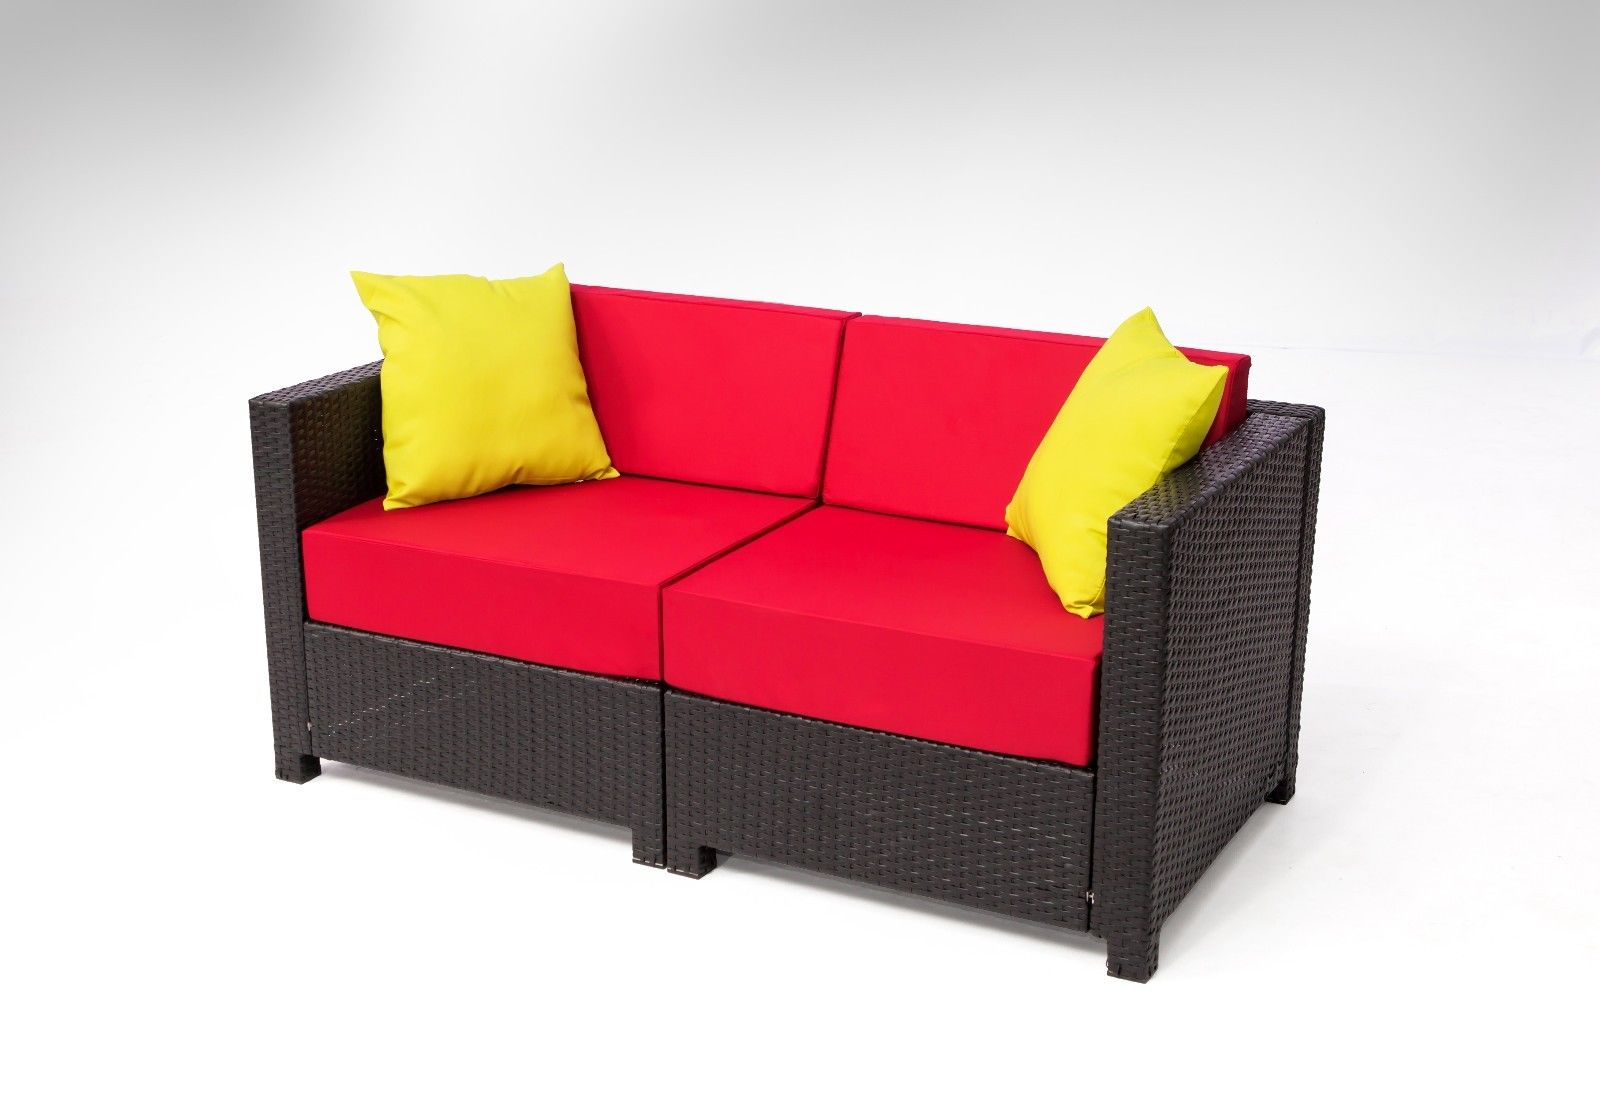 MCombo 7 Pcs Black Wicker Patio Sectional Indoor Sofa Furniture Set Burgund